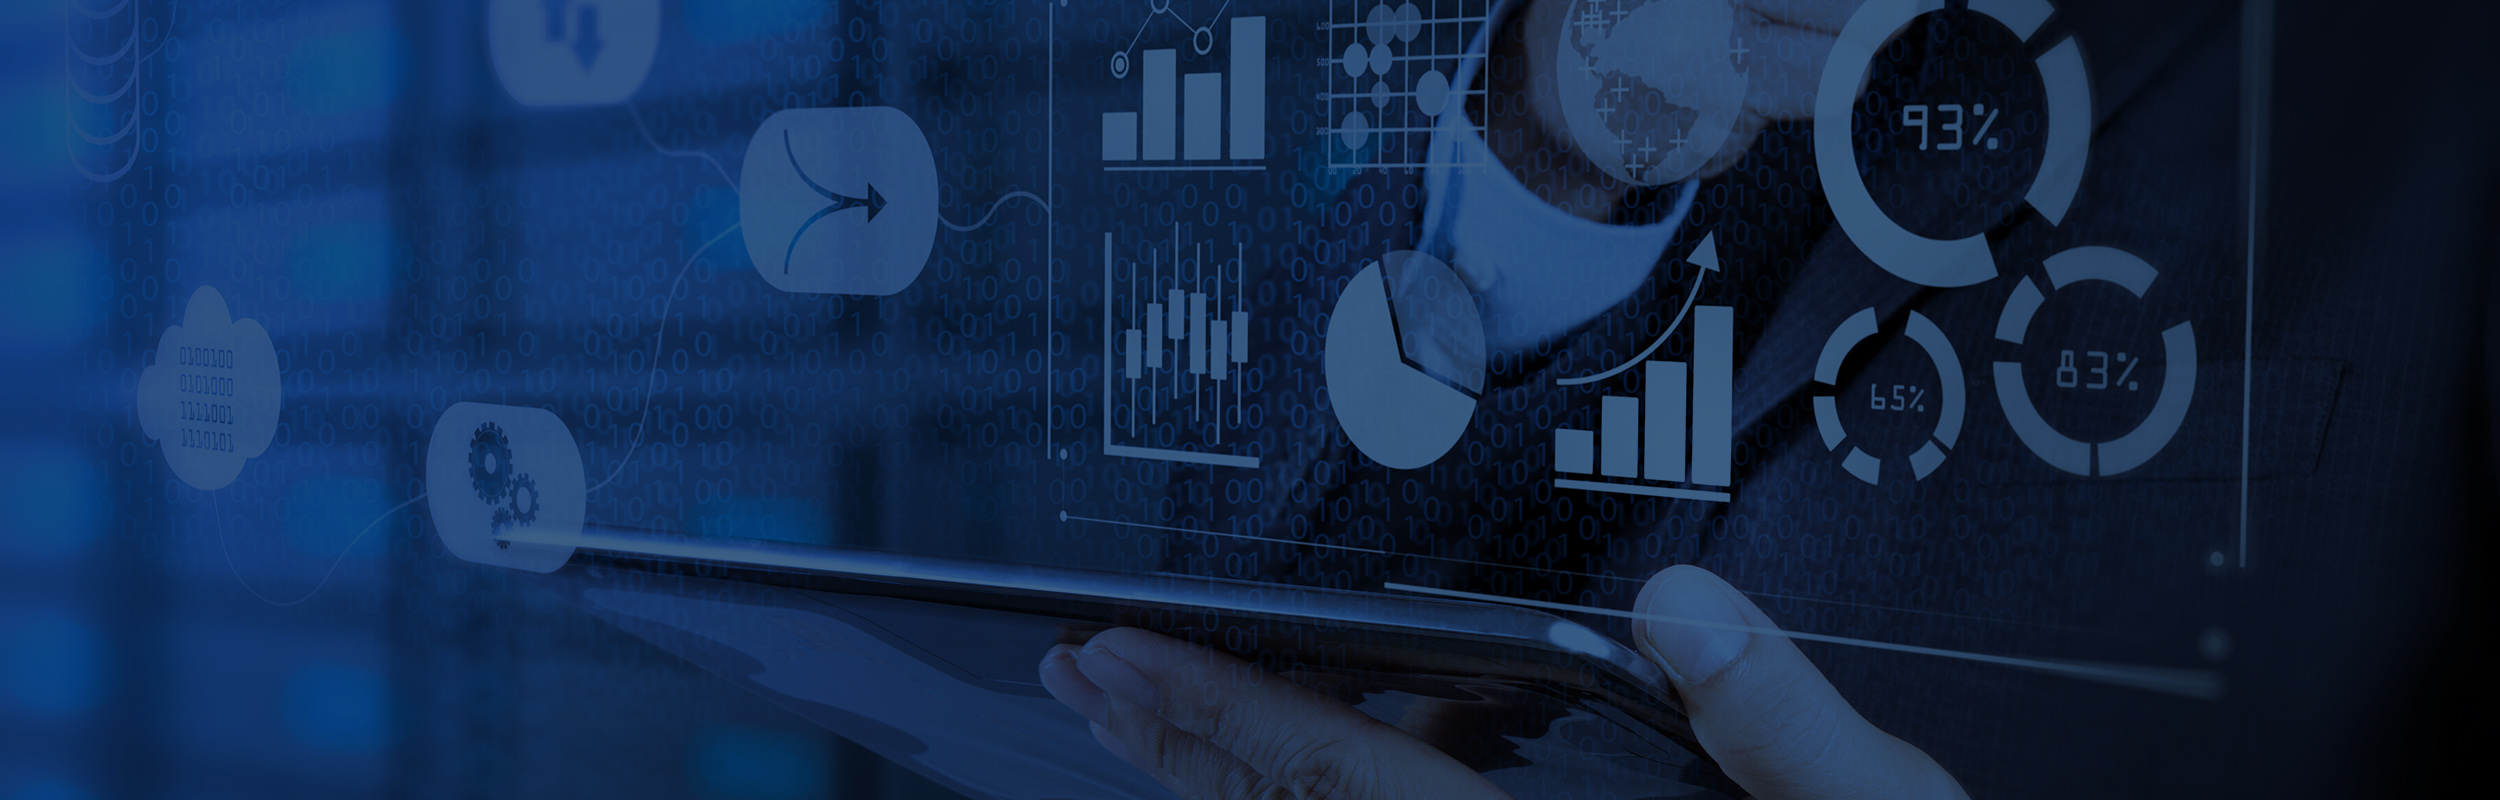 Information Technology / Data Analytics